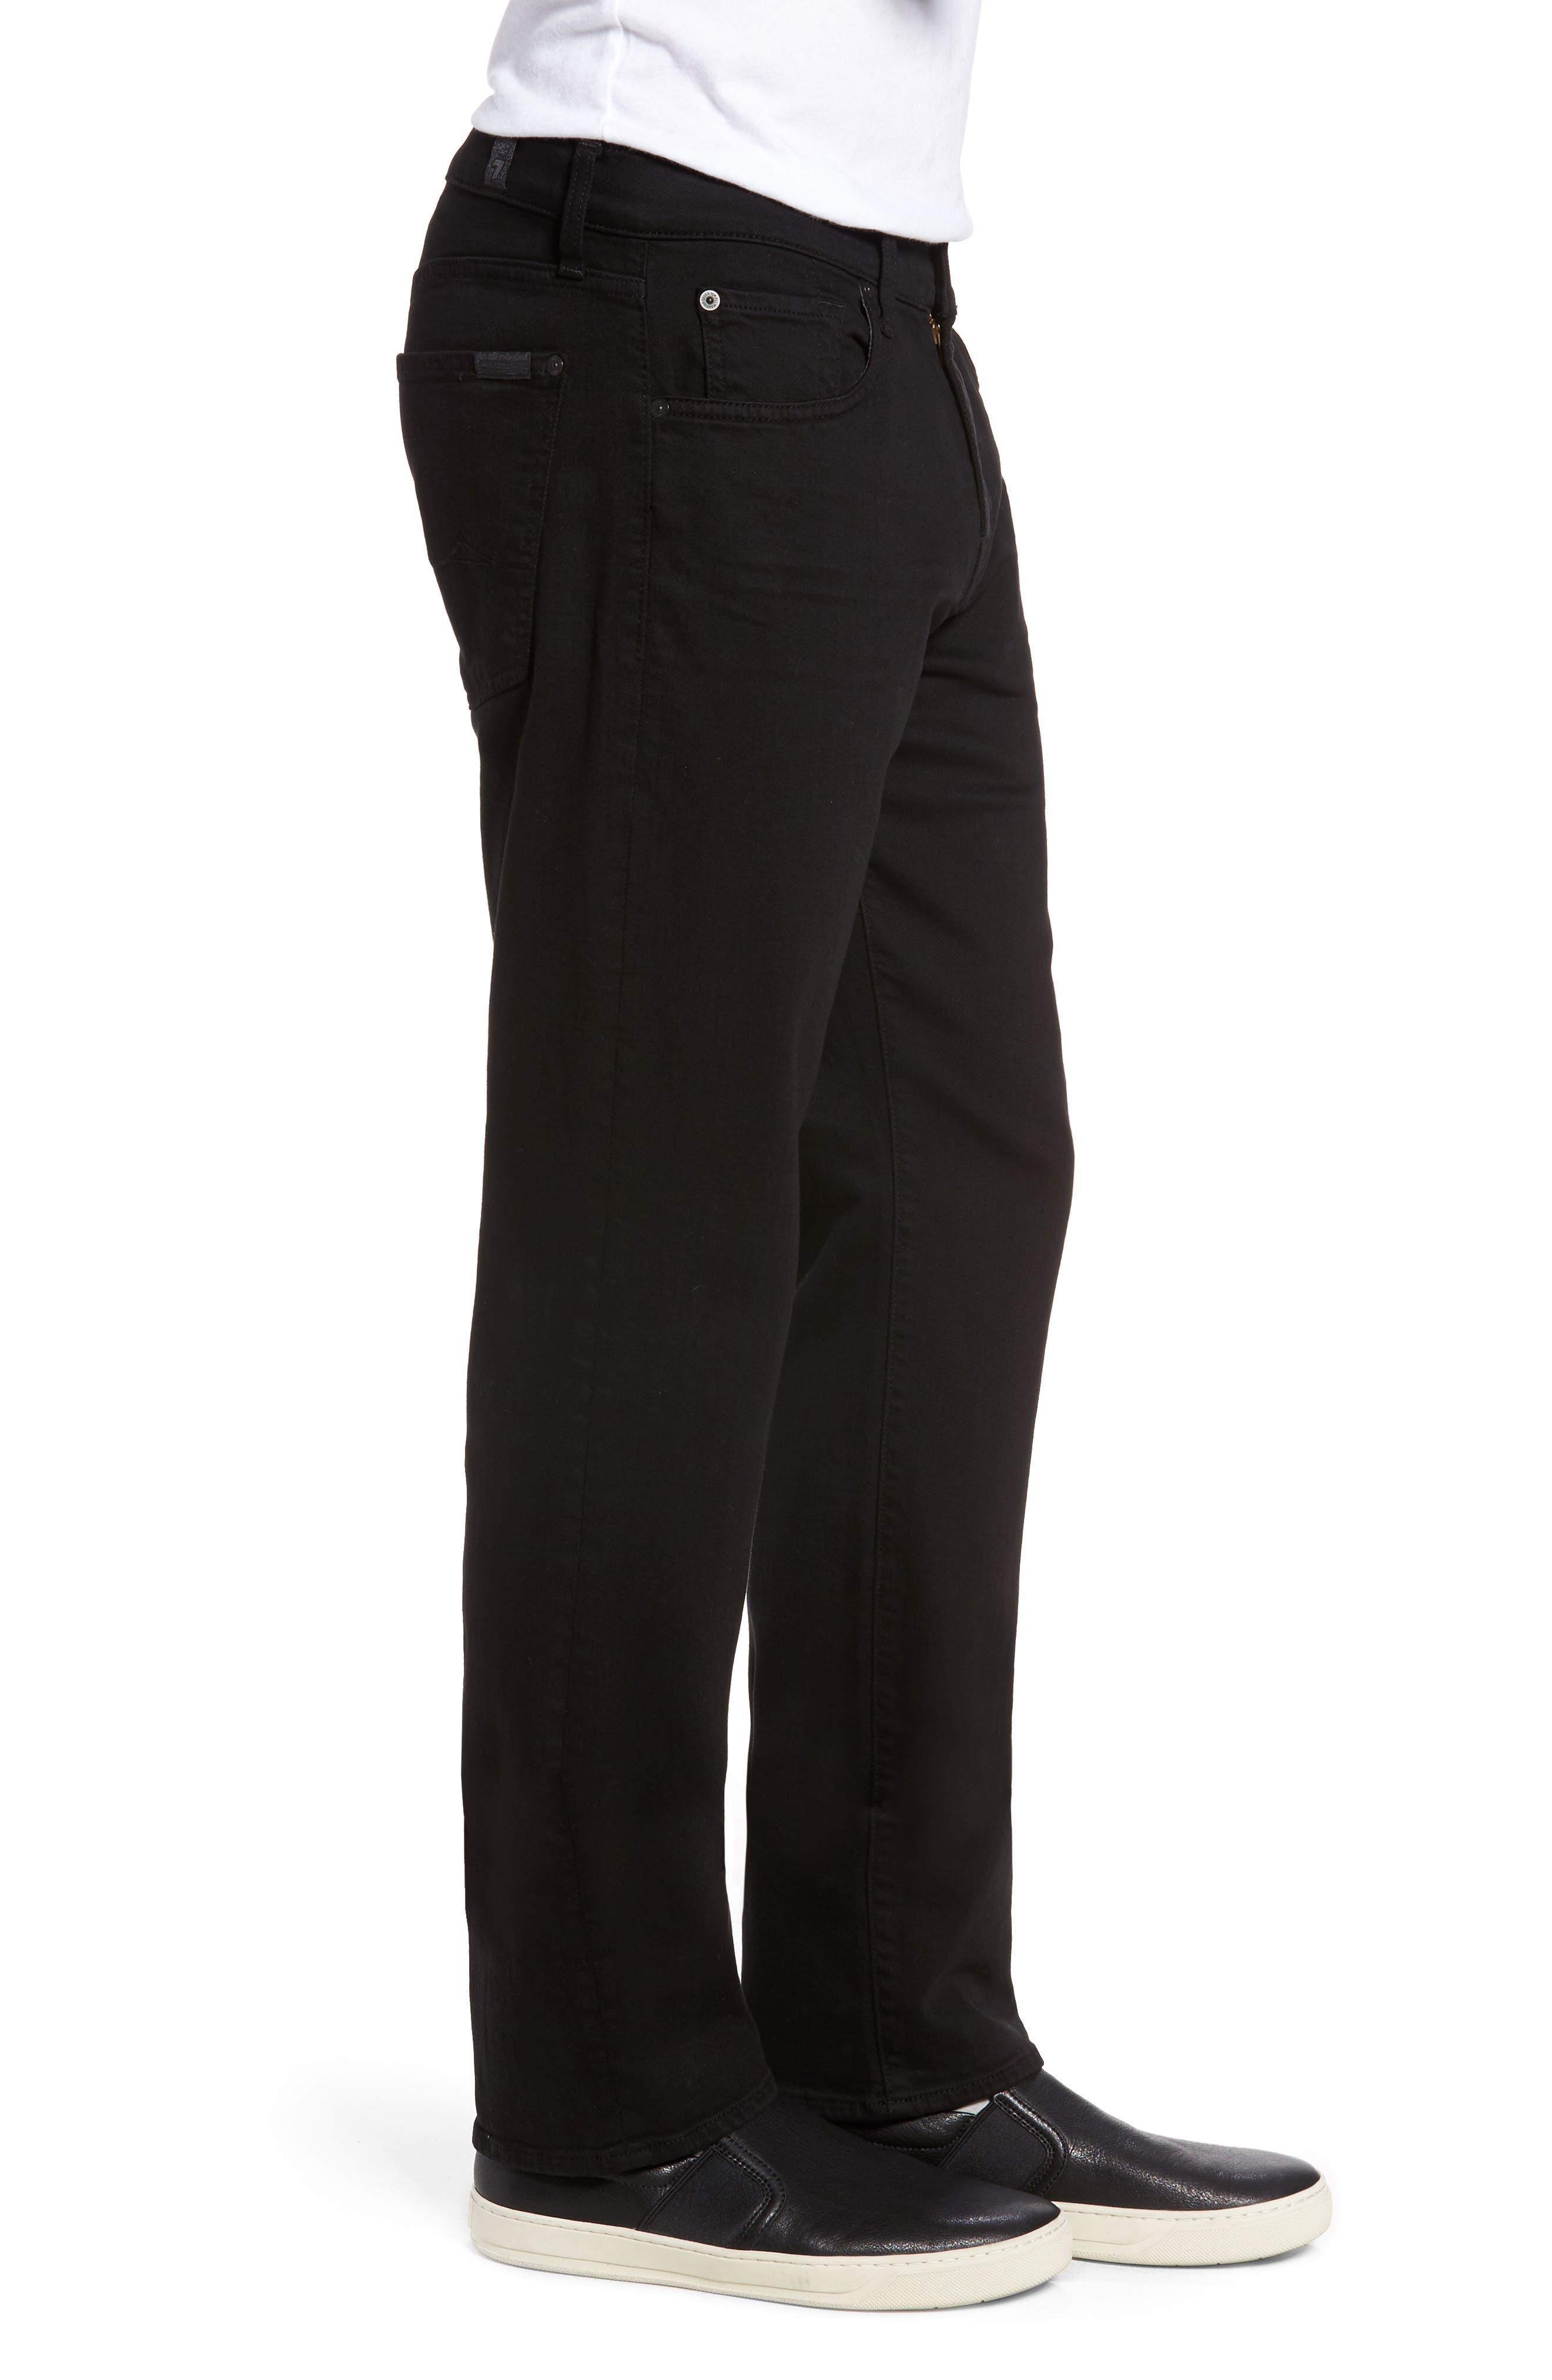 Luxe Performance - Slimmy Slim Fit Jeans,                             Alternate thumbnail 3, color,                             ANNEX BLACK